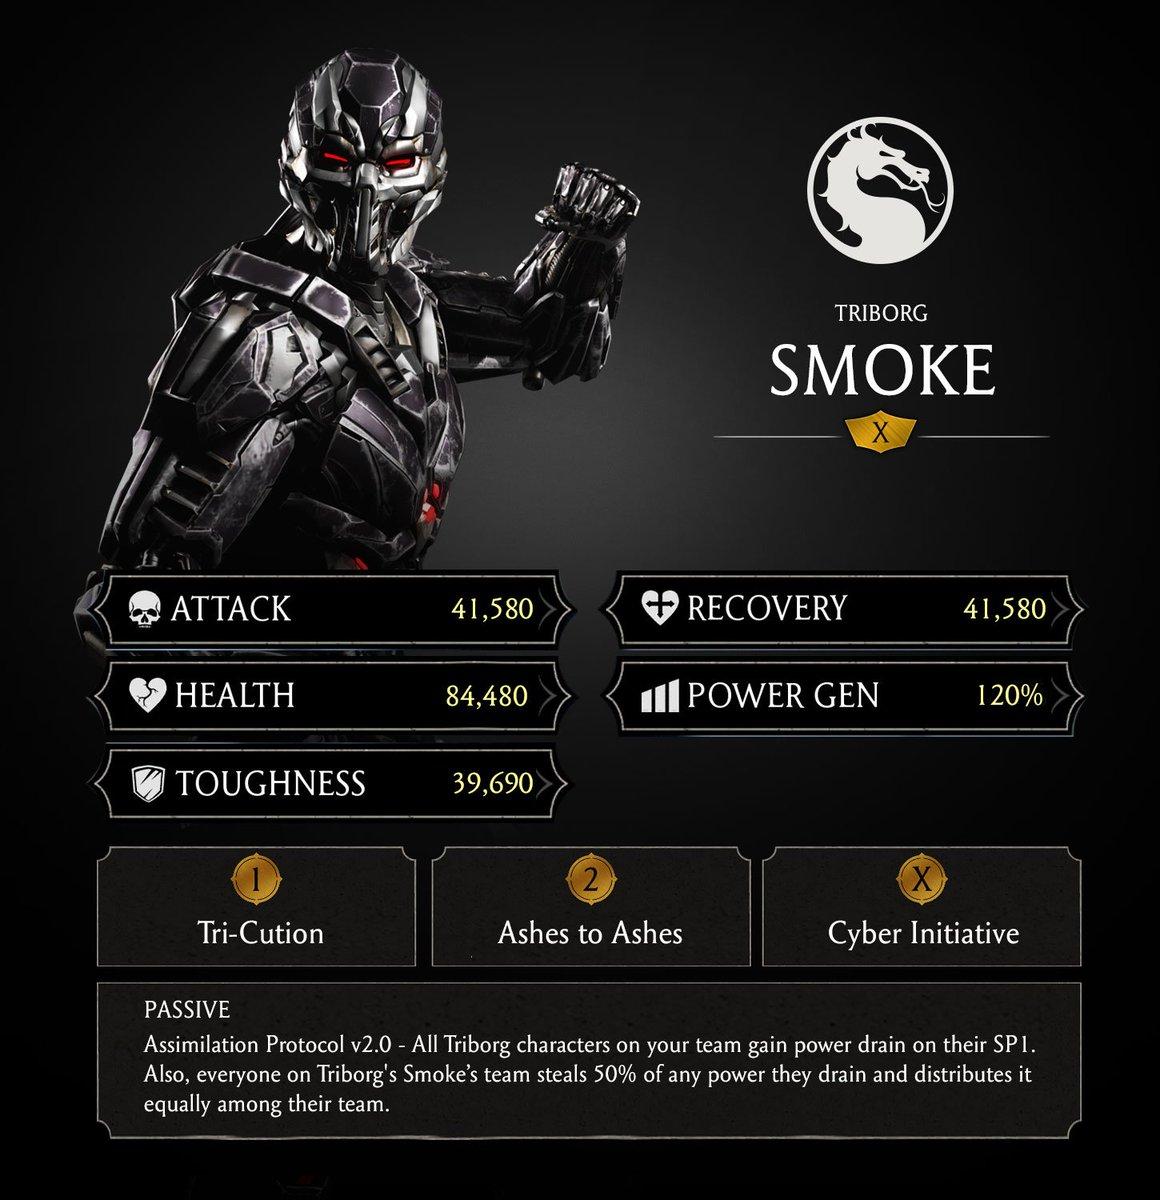 Mortal Kombat Mobile Character List